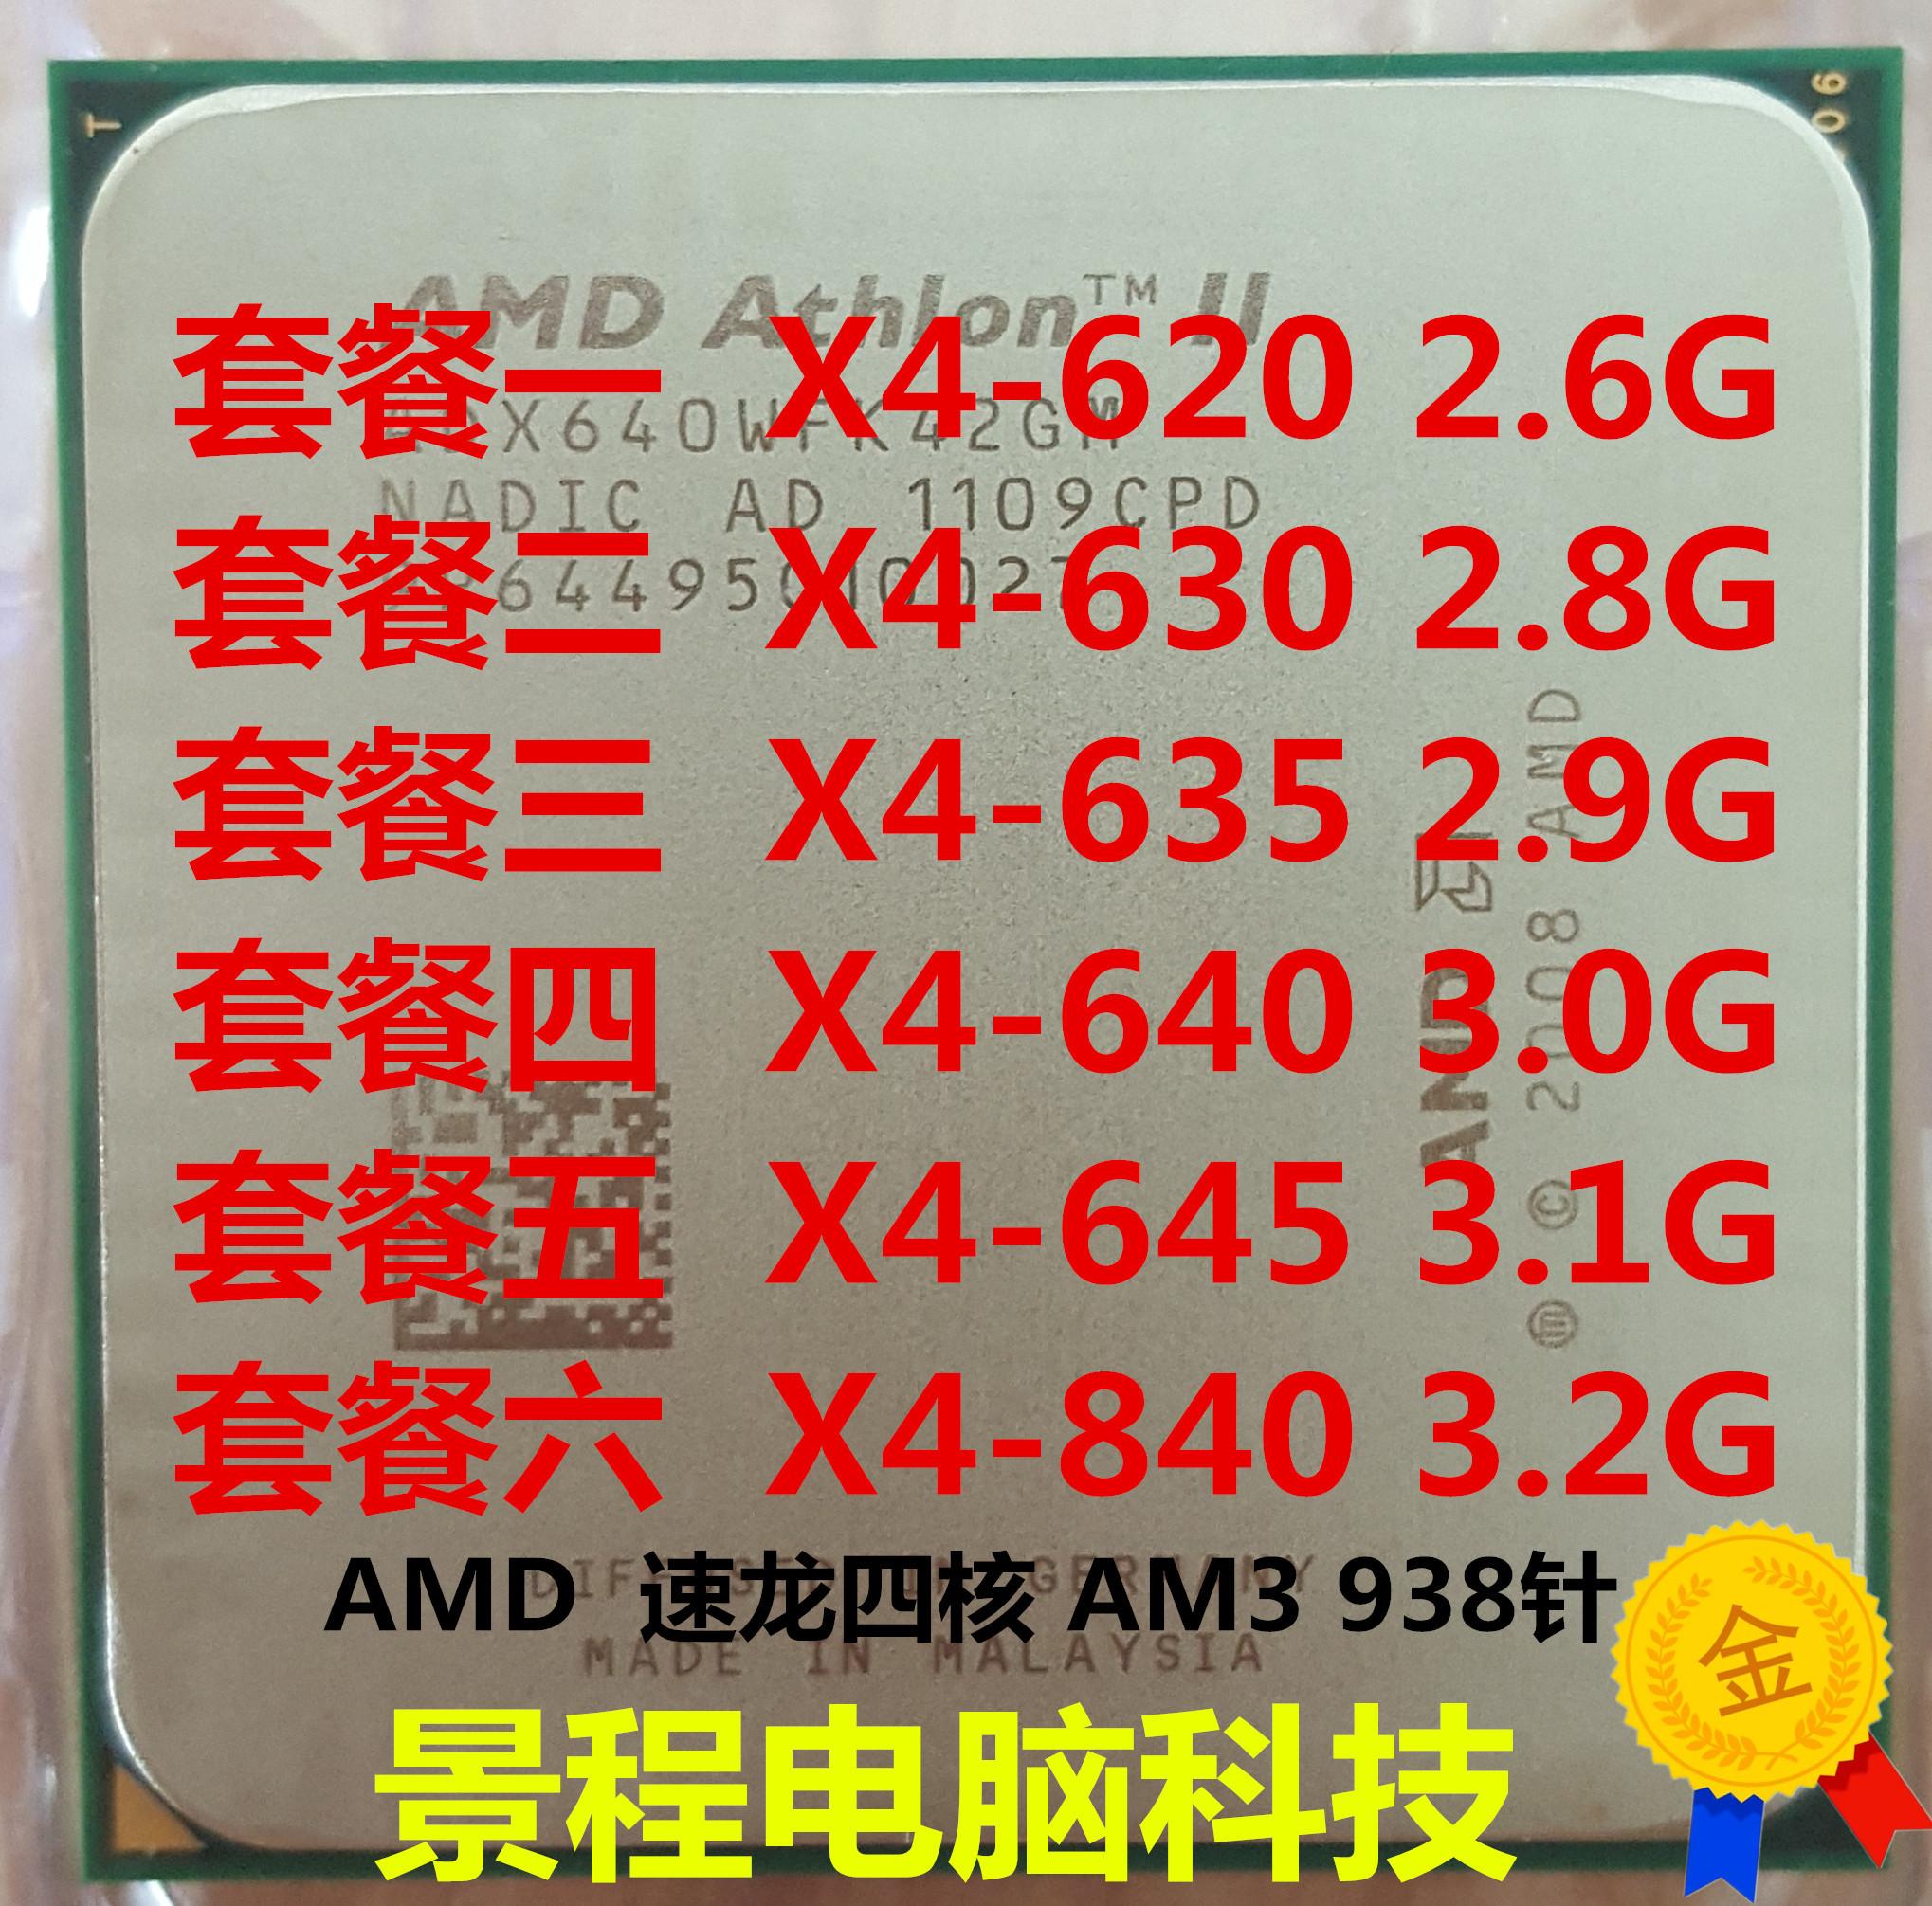 AMD Athlon II X4 640 620 630 635 速龙 四核CPU 3.0G AM3 938针